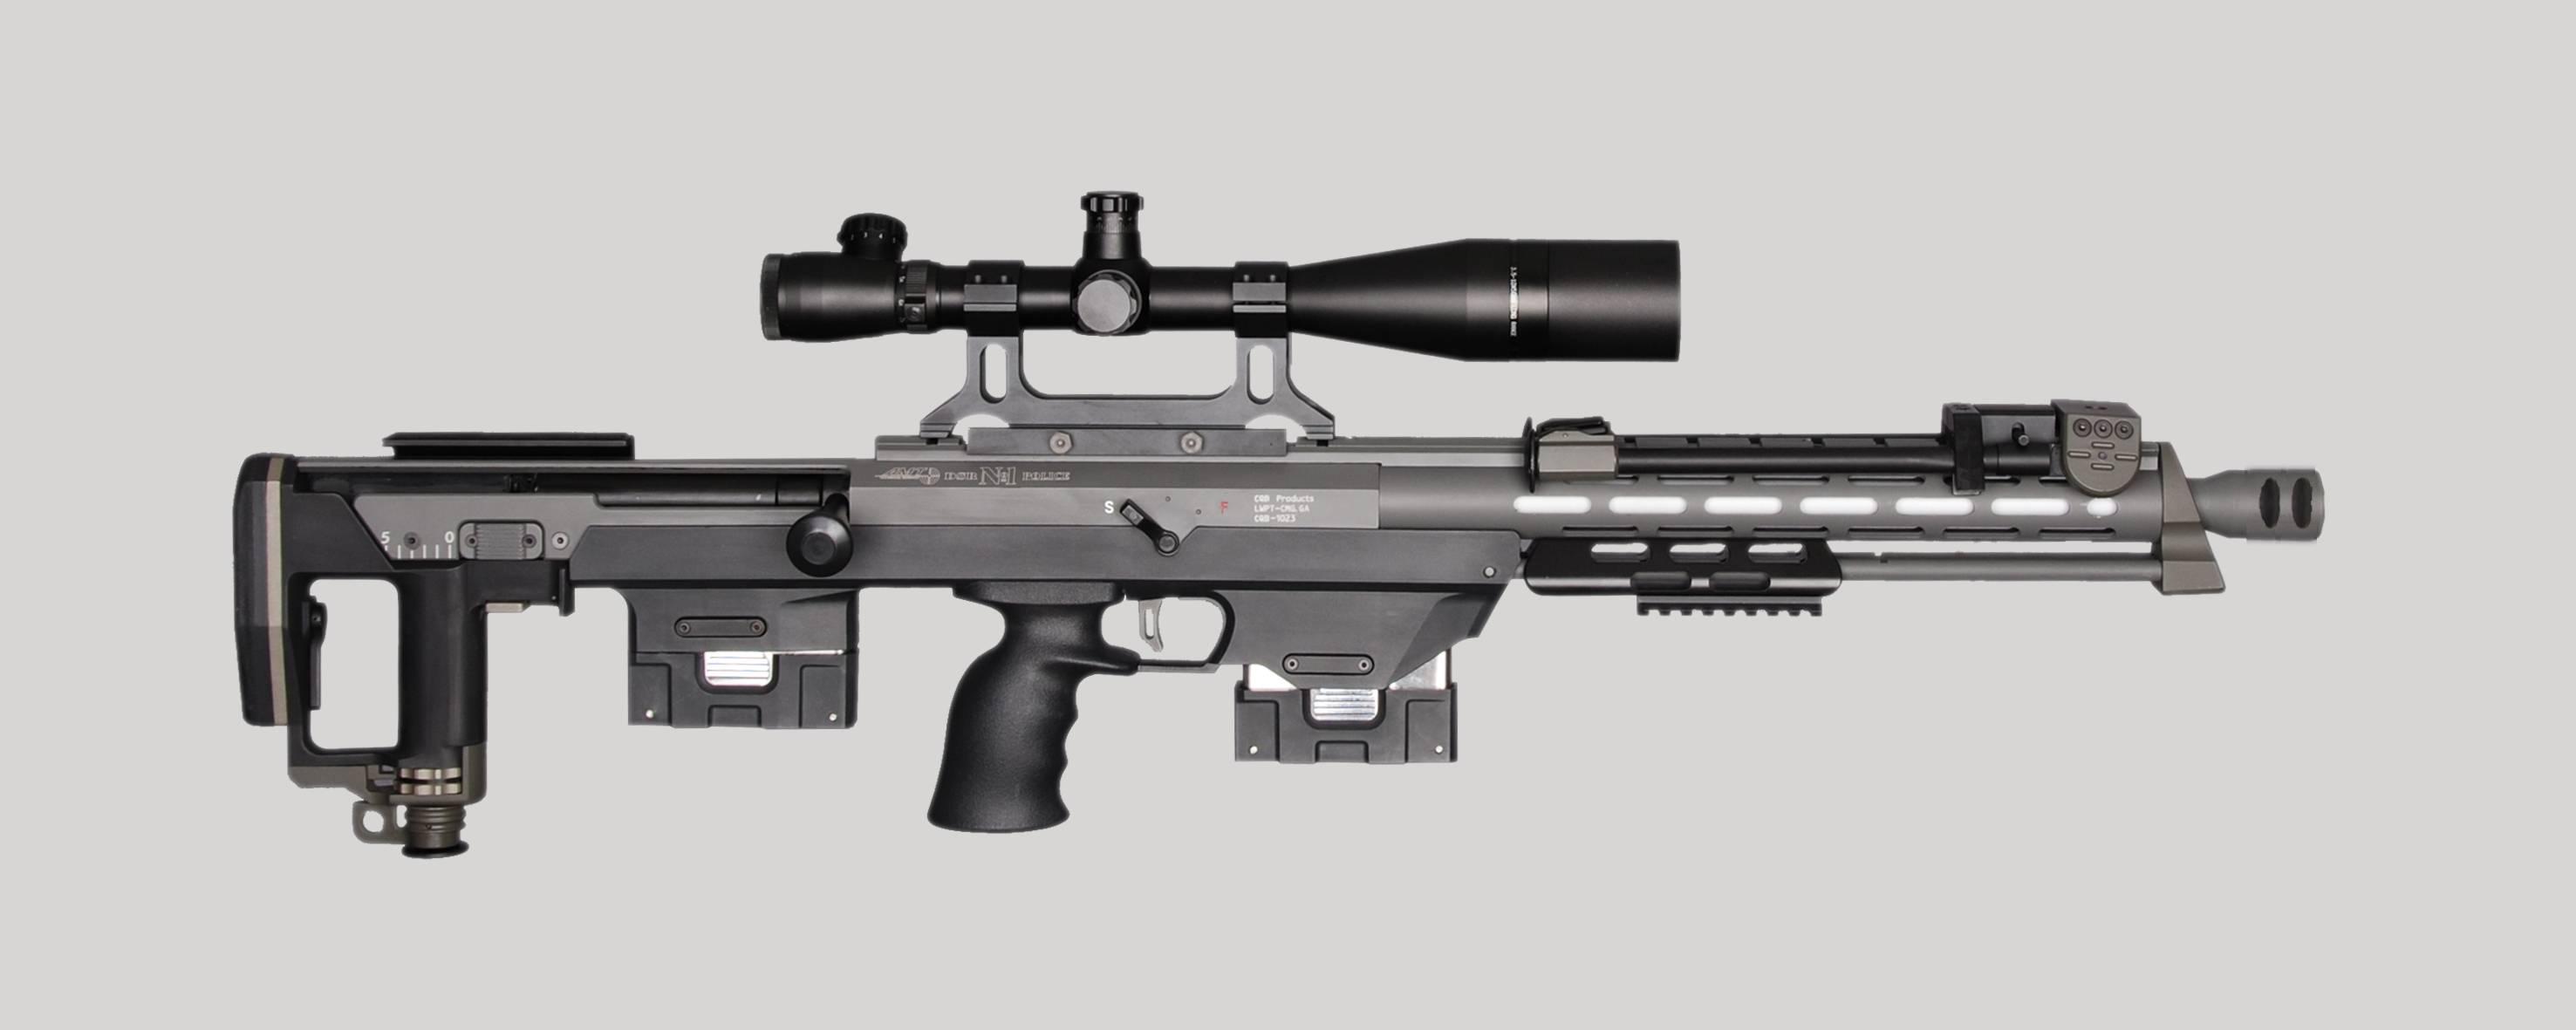 Снайперская винтовка DSR-precision DSR-1